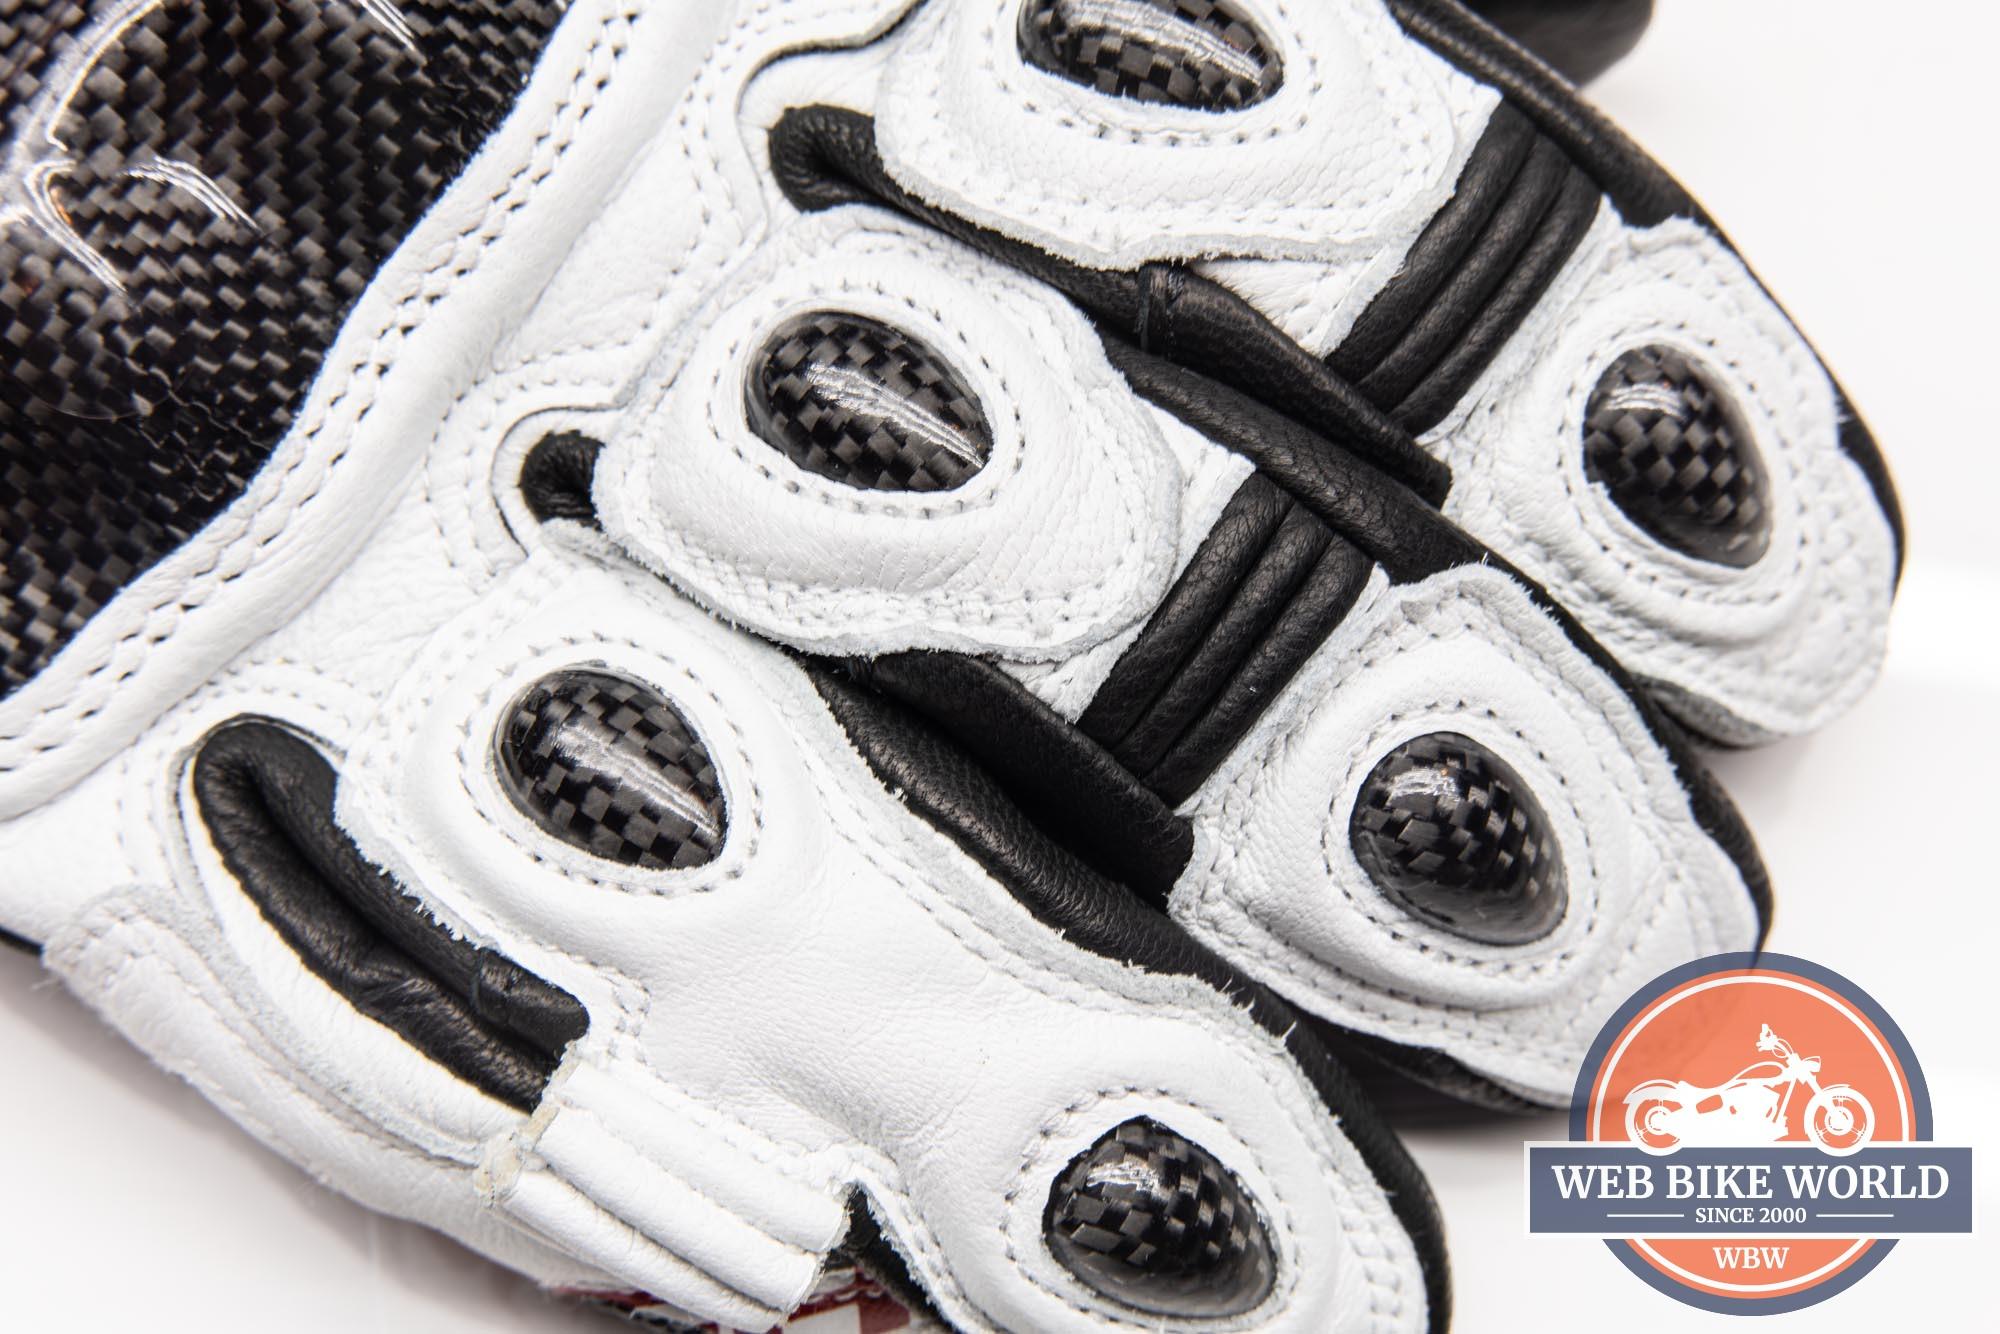 Knuckle carbon fiber protection